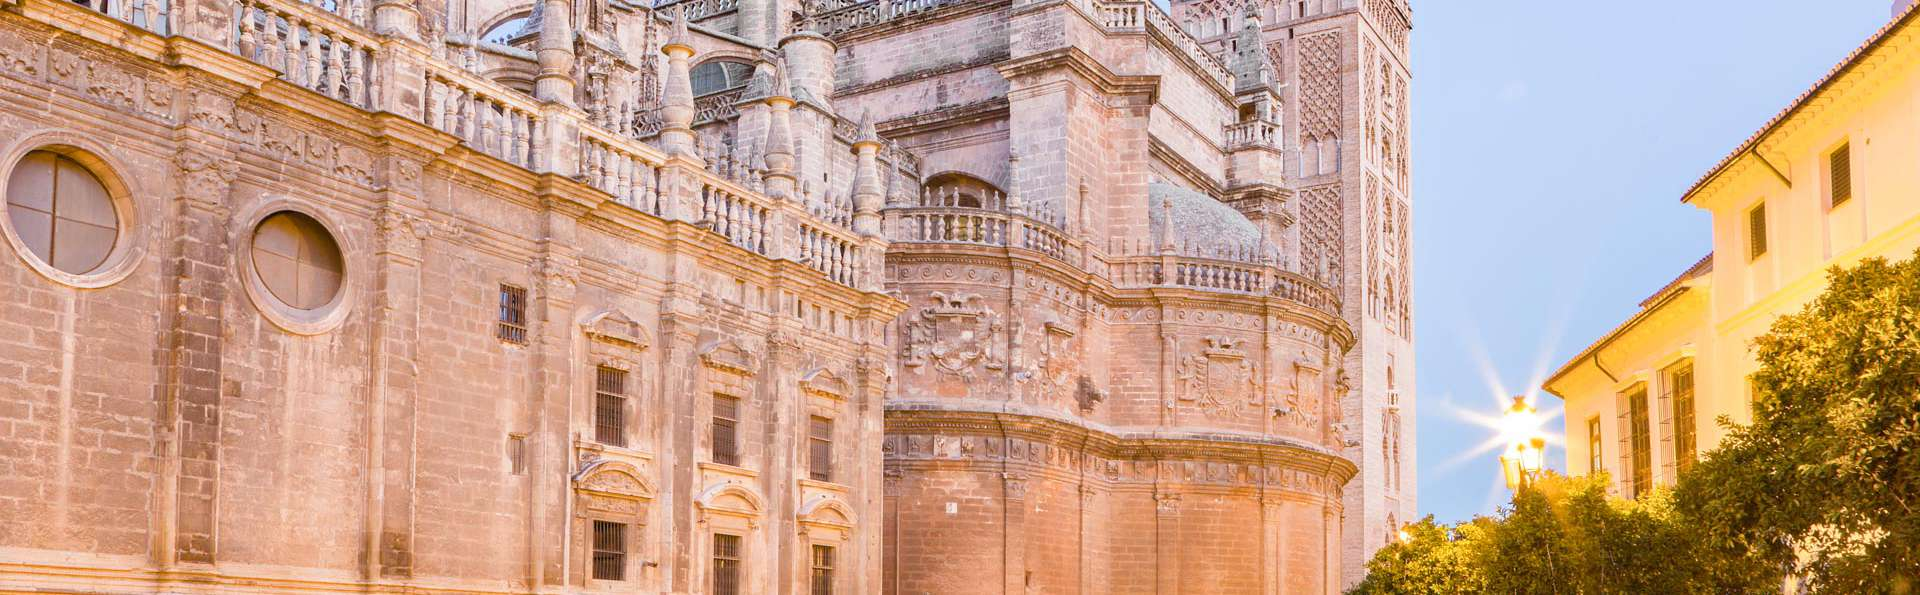 Petit Palace Puerta de Triana - EDIT_DESTINATION_01.jpg